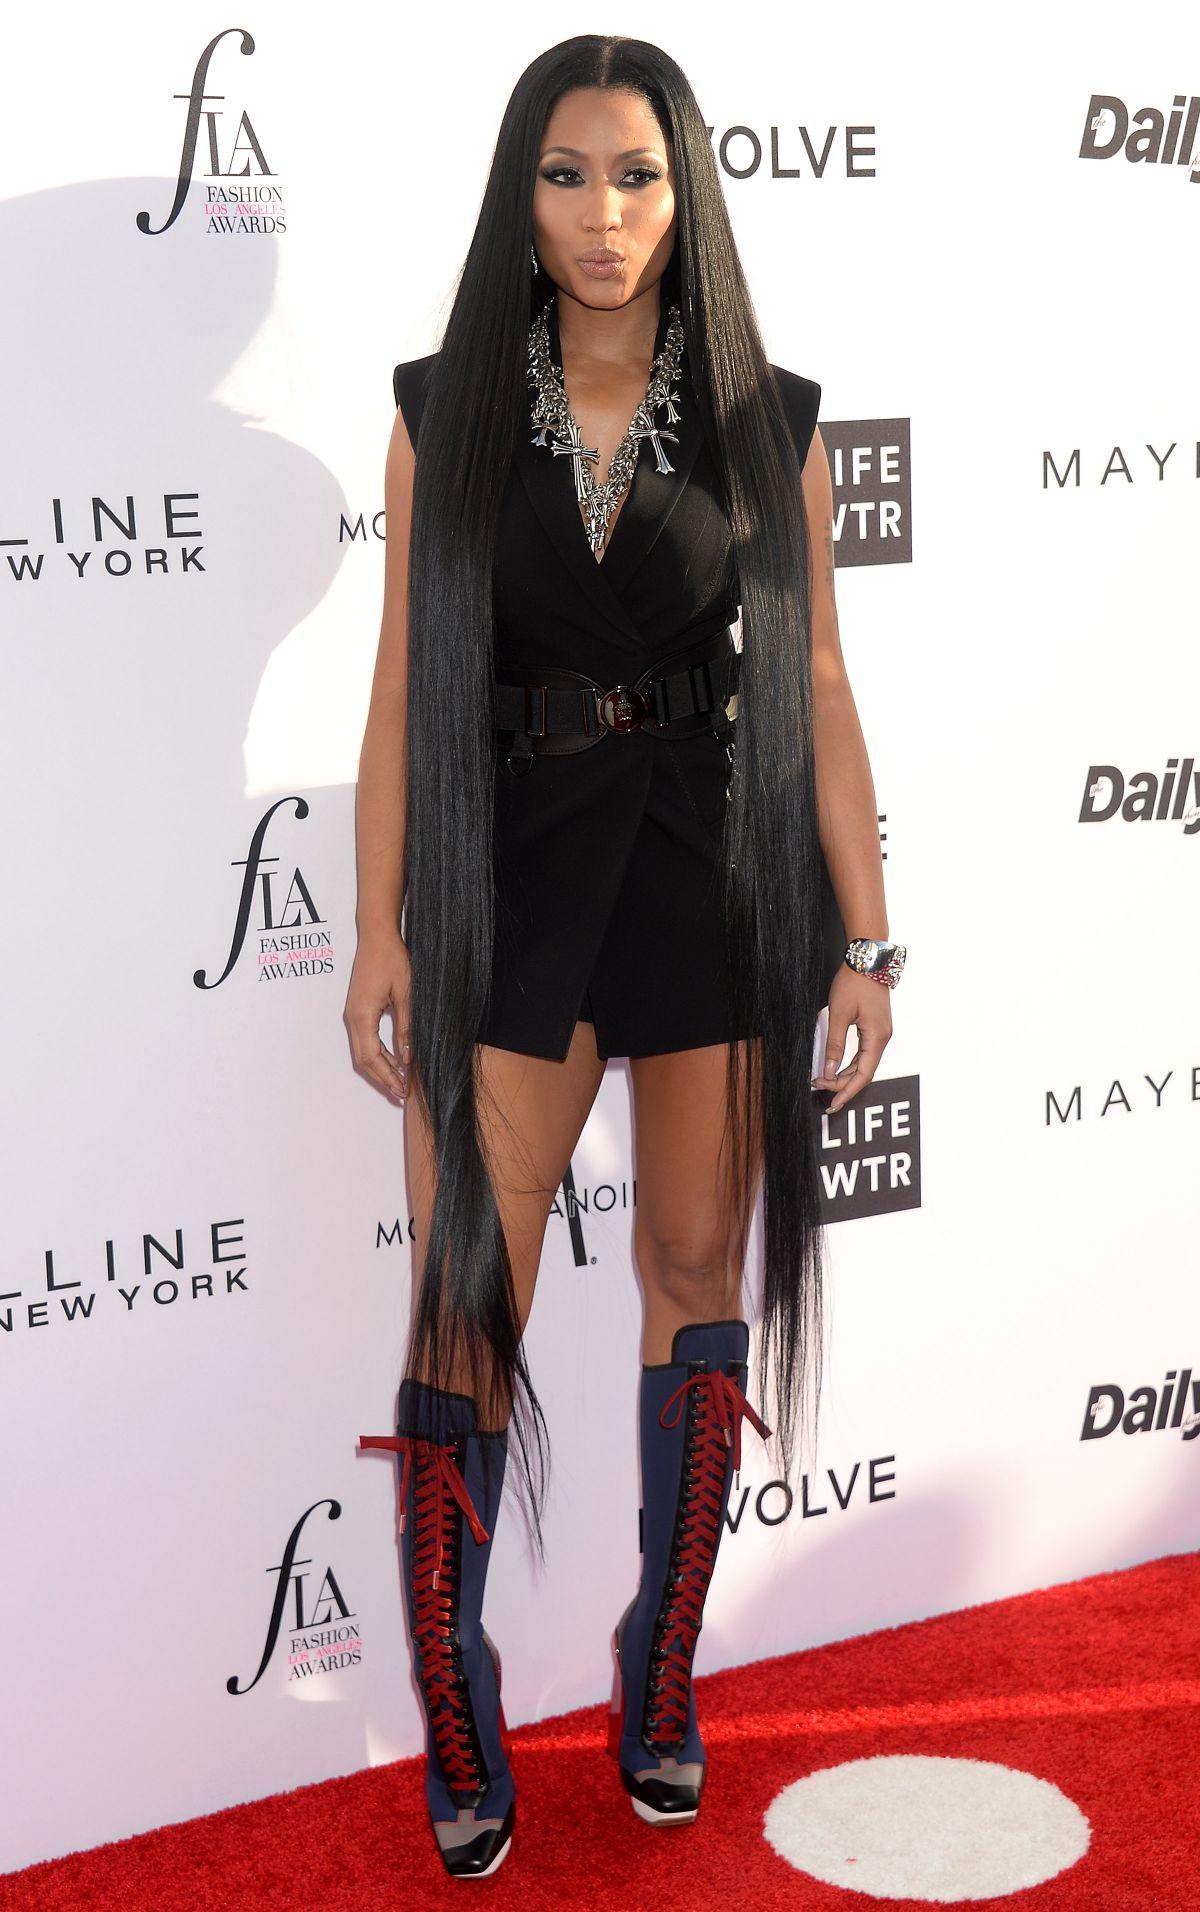 Nicki Minaj Nickiminaj Shows Her Legs In A Short Dress  Bootymotiontv-3506